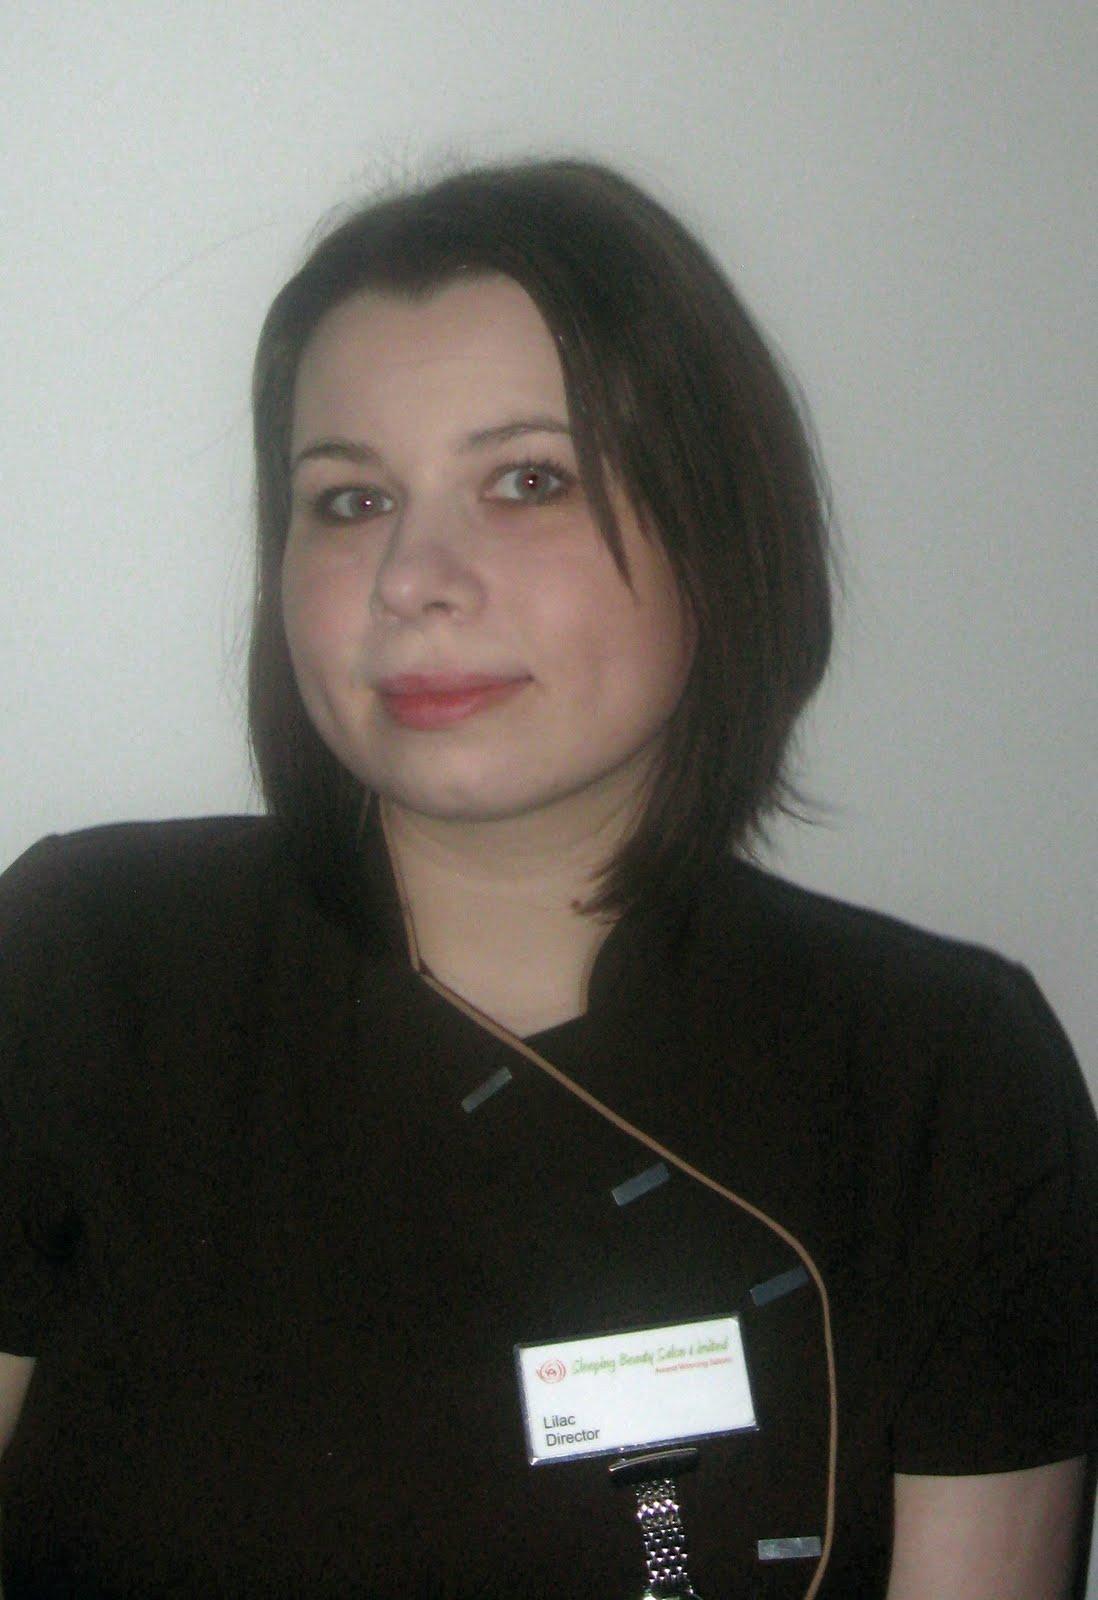 Lilac Miller 4